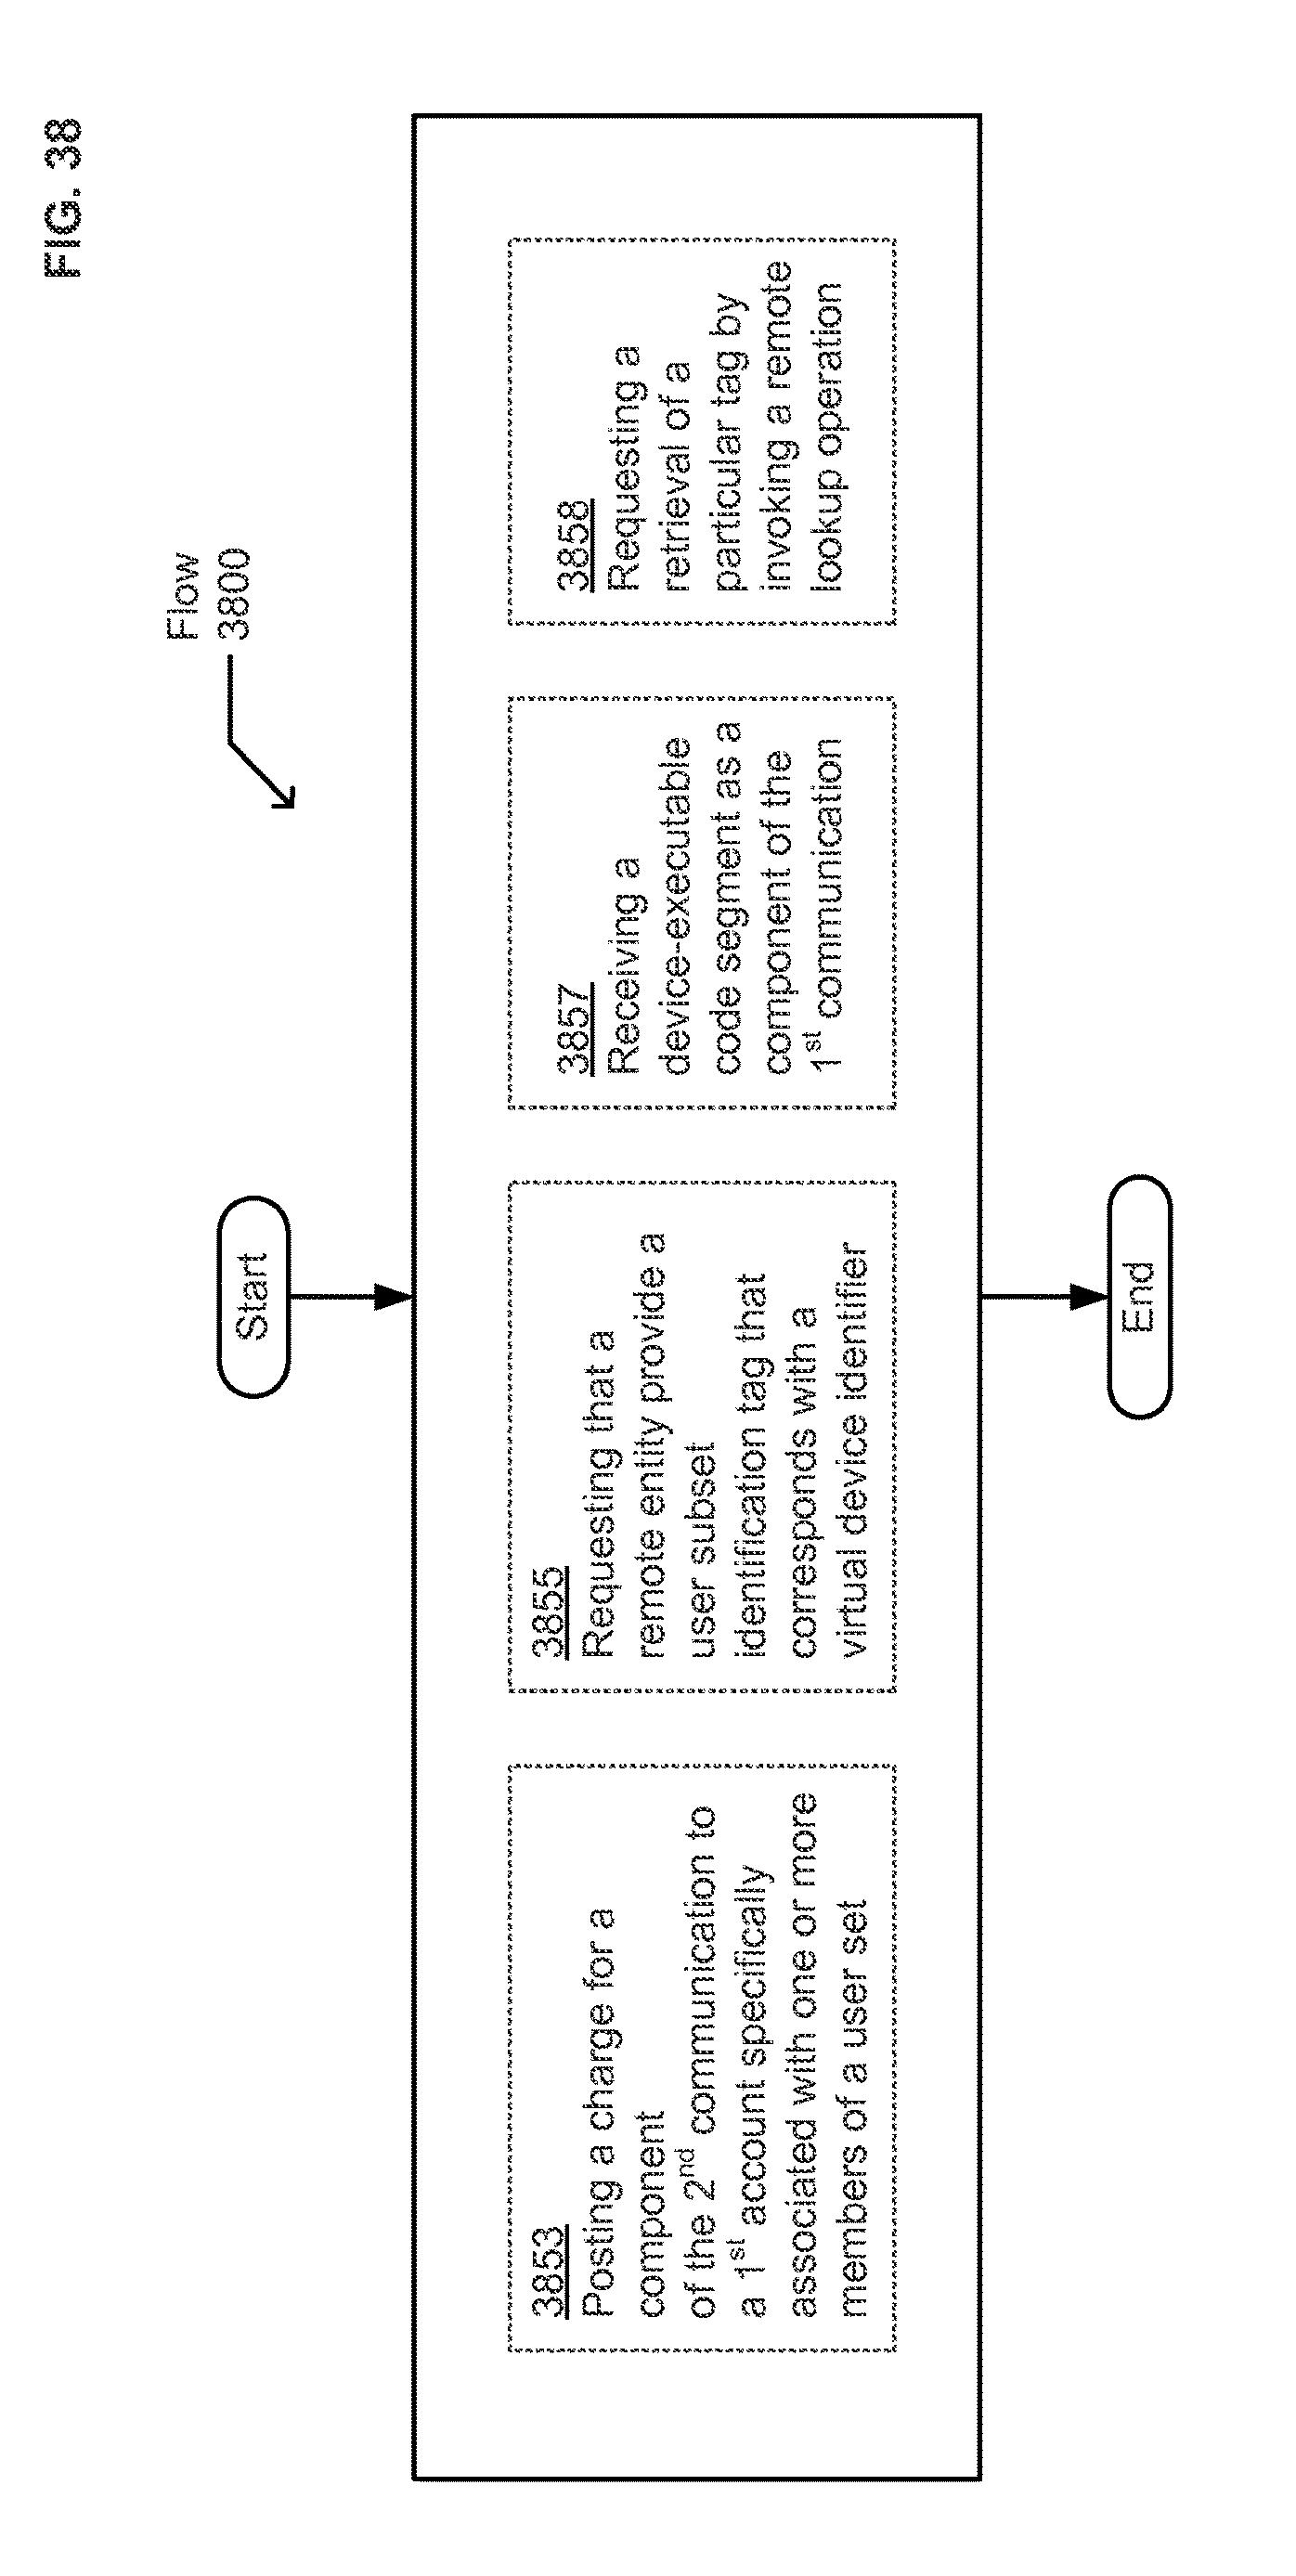 Patent US 9,774,728 B2